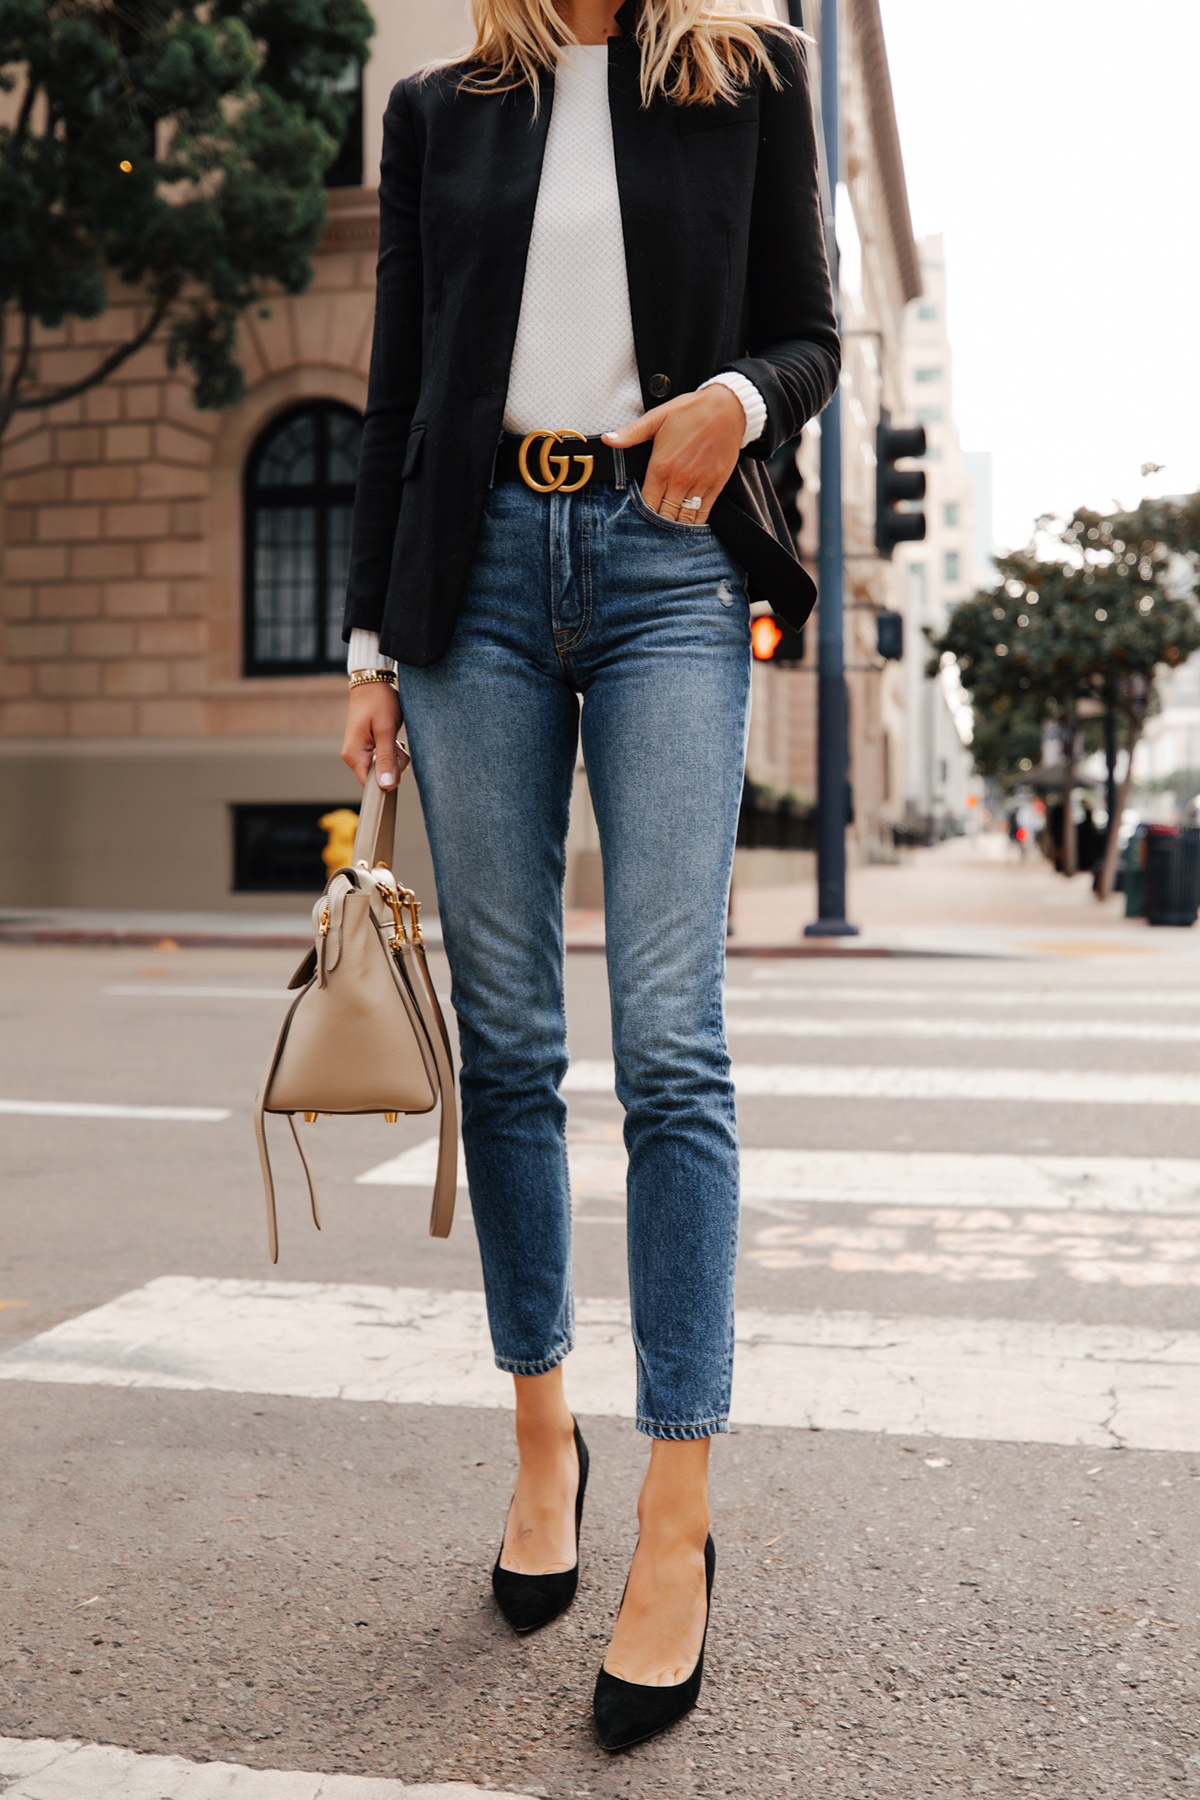 Fashion Jackson Wearing Jcrew Regent Black Blazer White Sweater Gucci Double G Black Belt Skinny Jeans Black Pumps